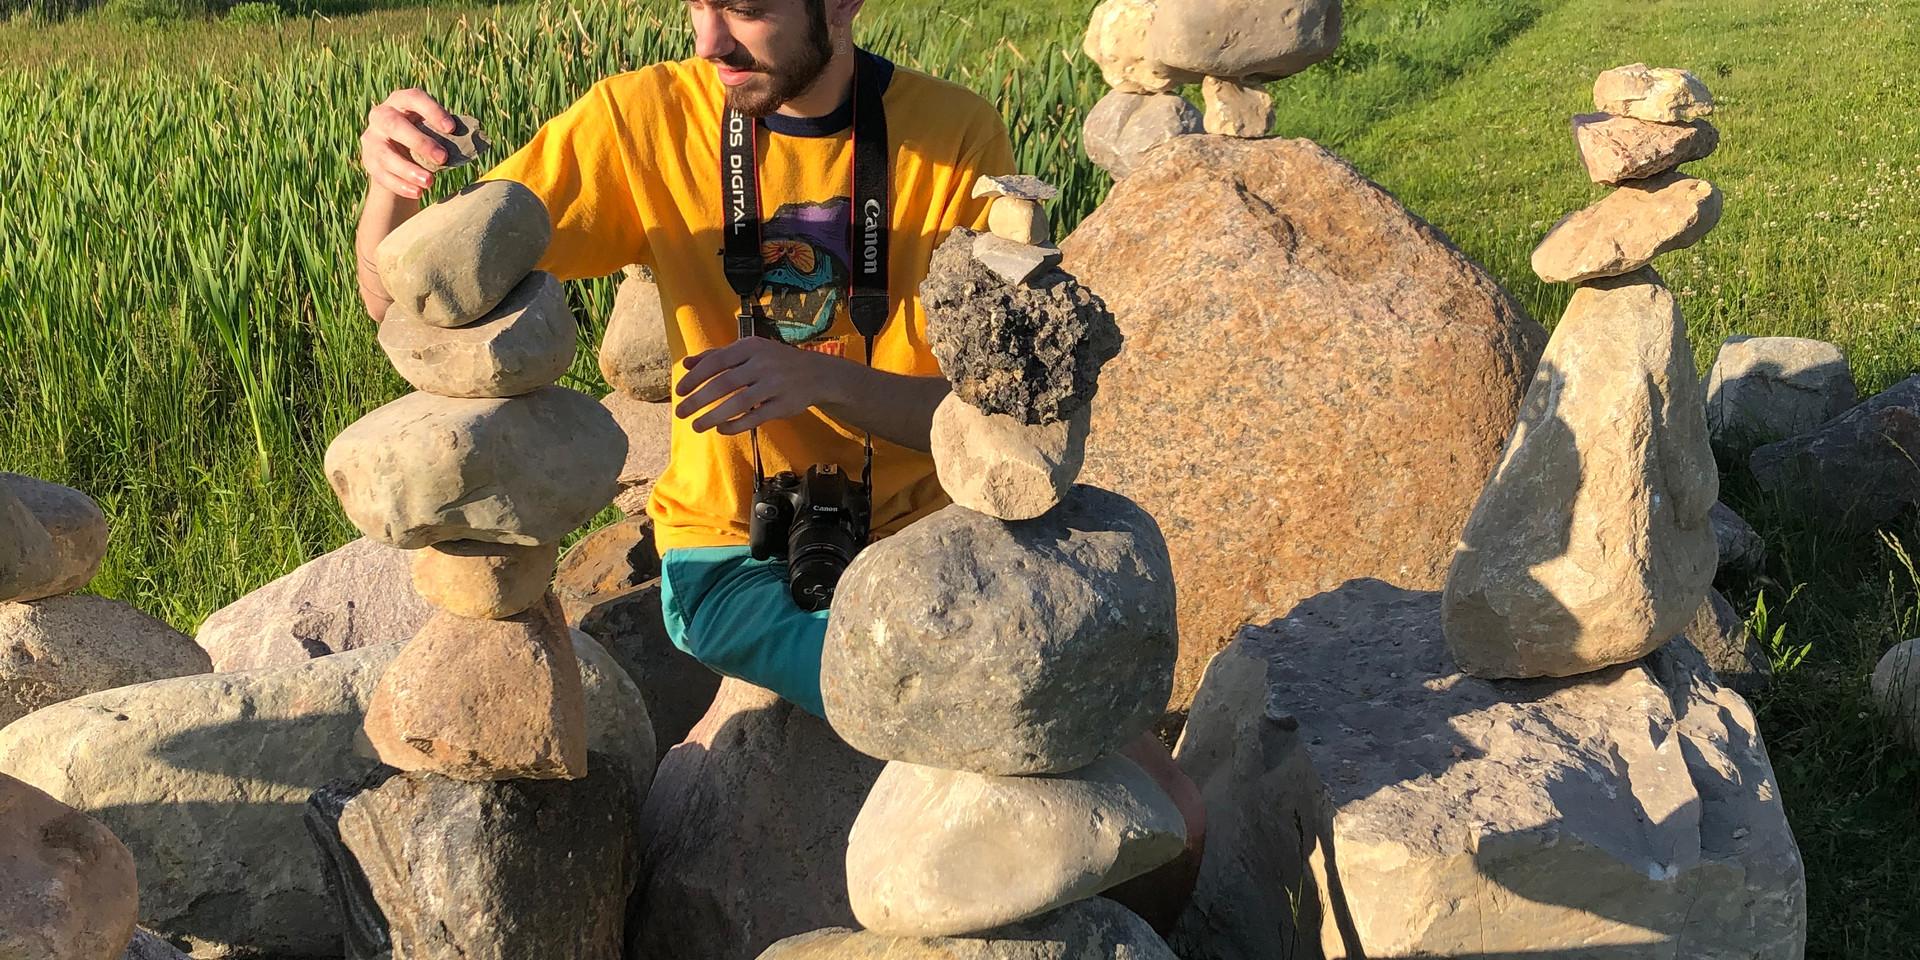 Socializing with Rocks